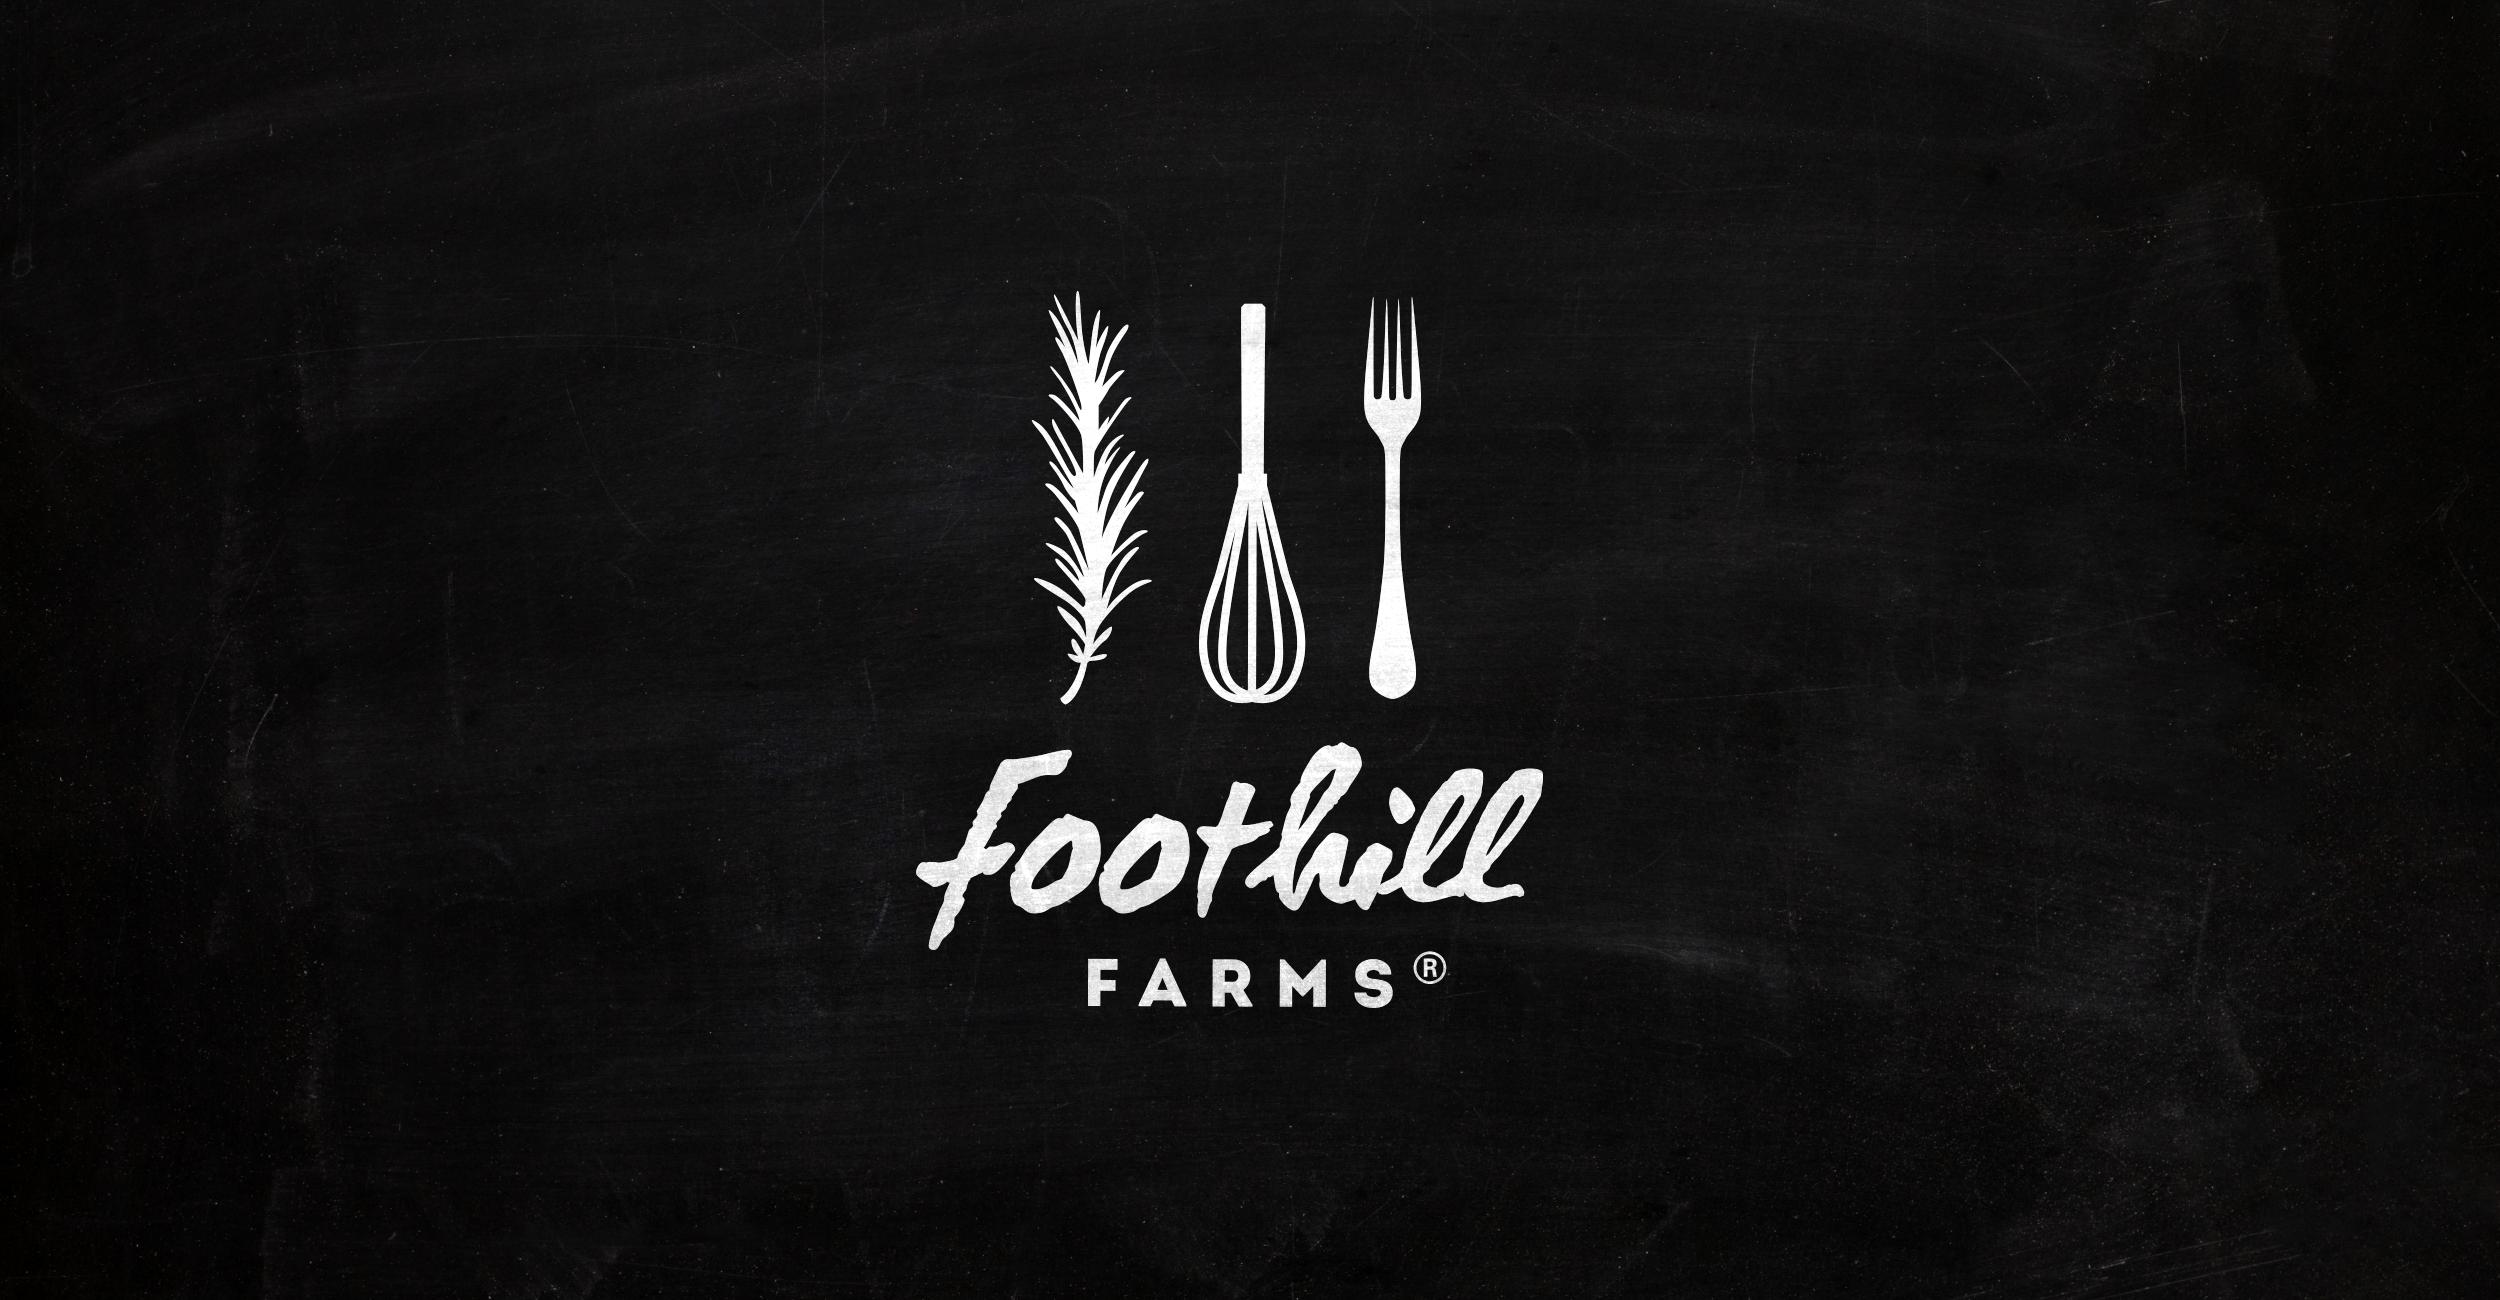 foothillfarms_logo.png